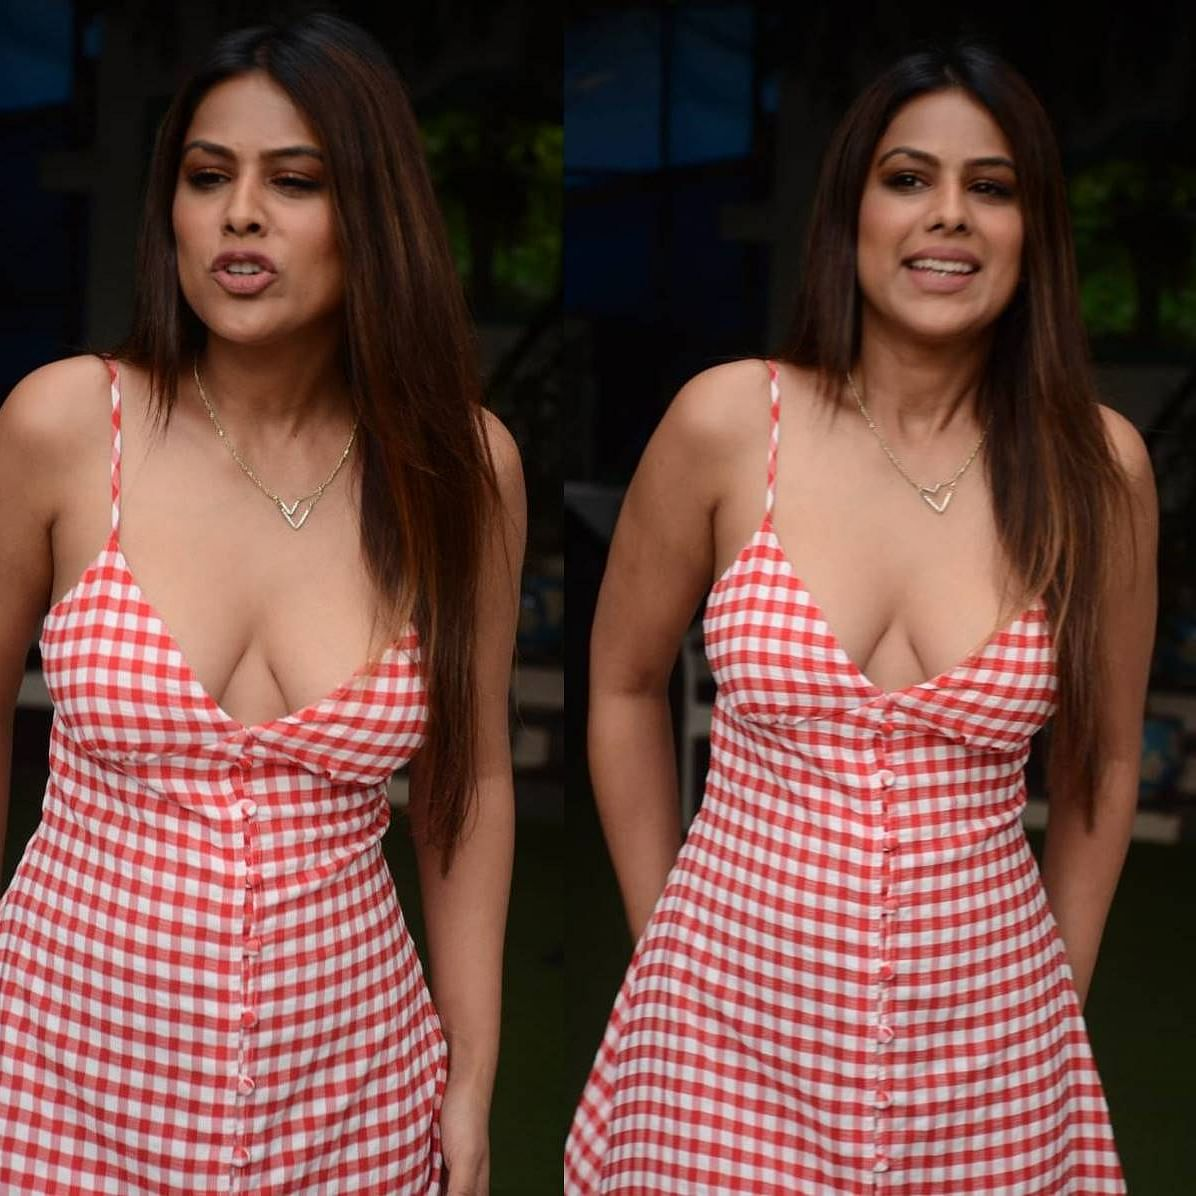 'Sharam nai aati': Nia Sharma trolled for wearing 'vulgar' outfit - watch video